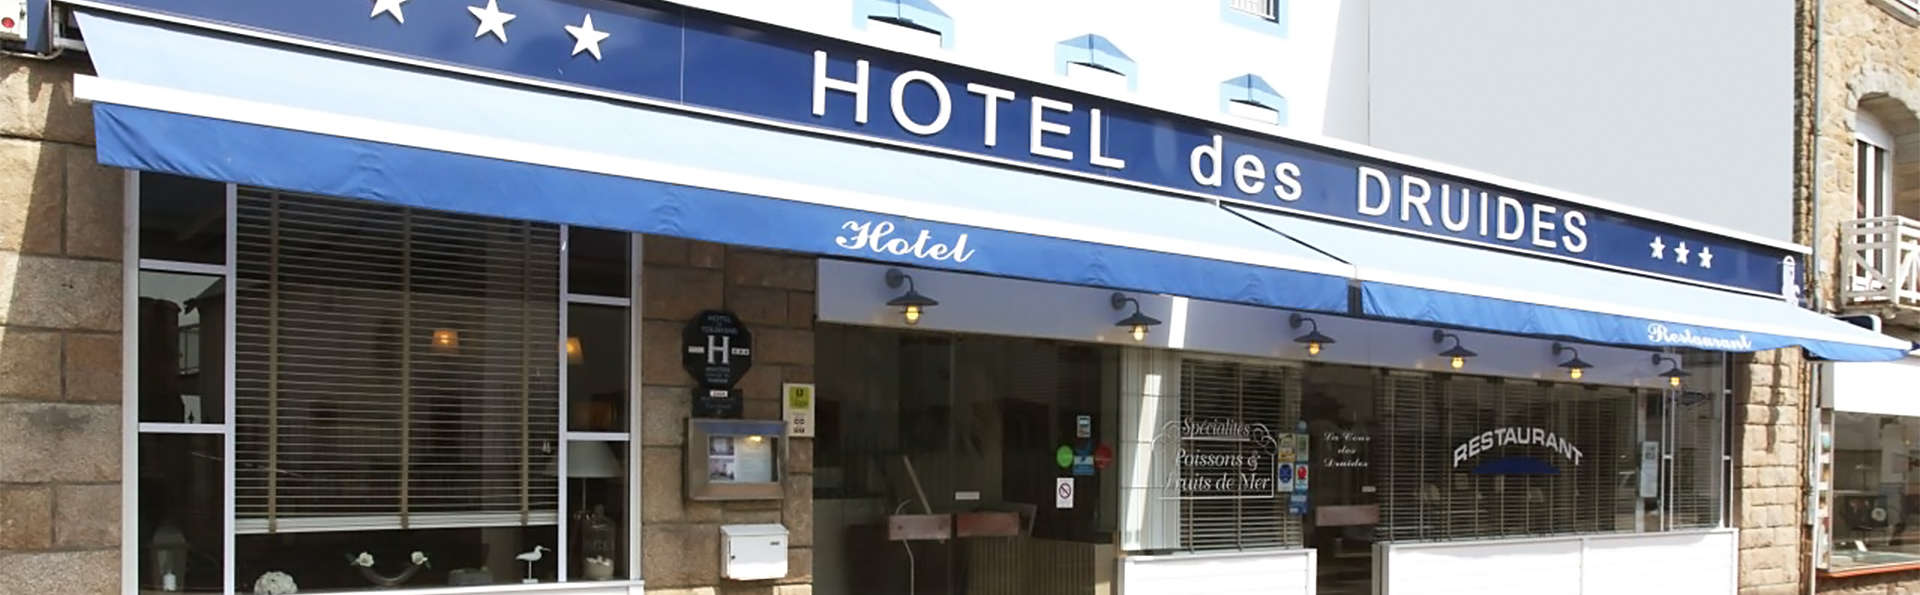 Hôtel des Druides - EDIT_front1.jpg